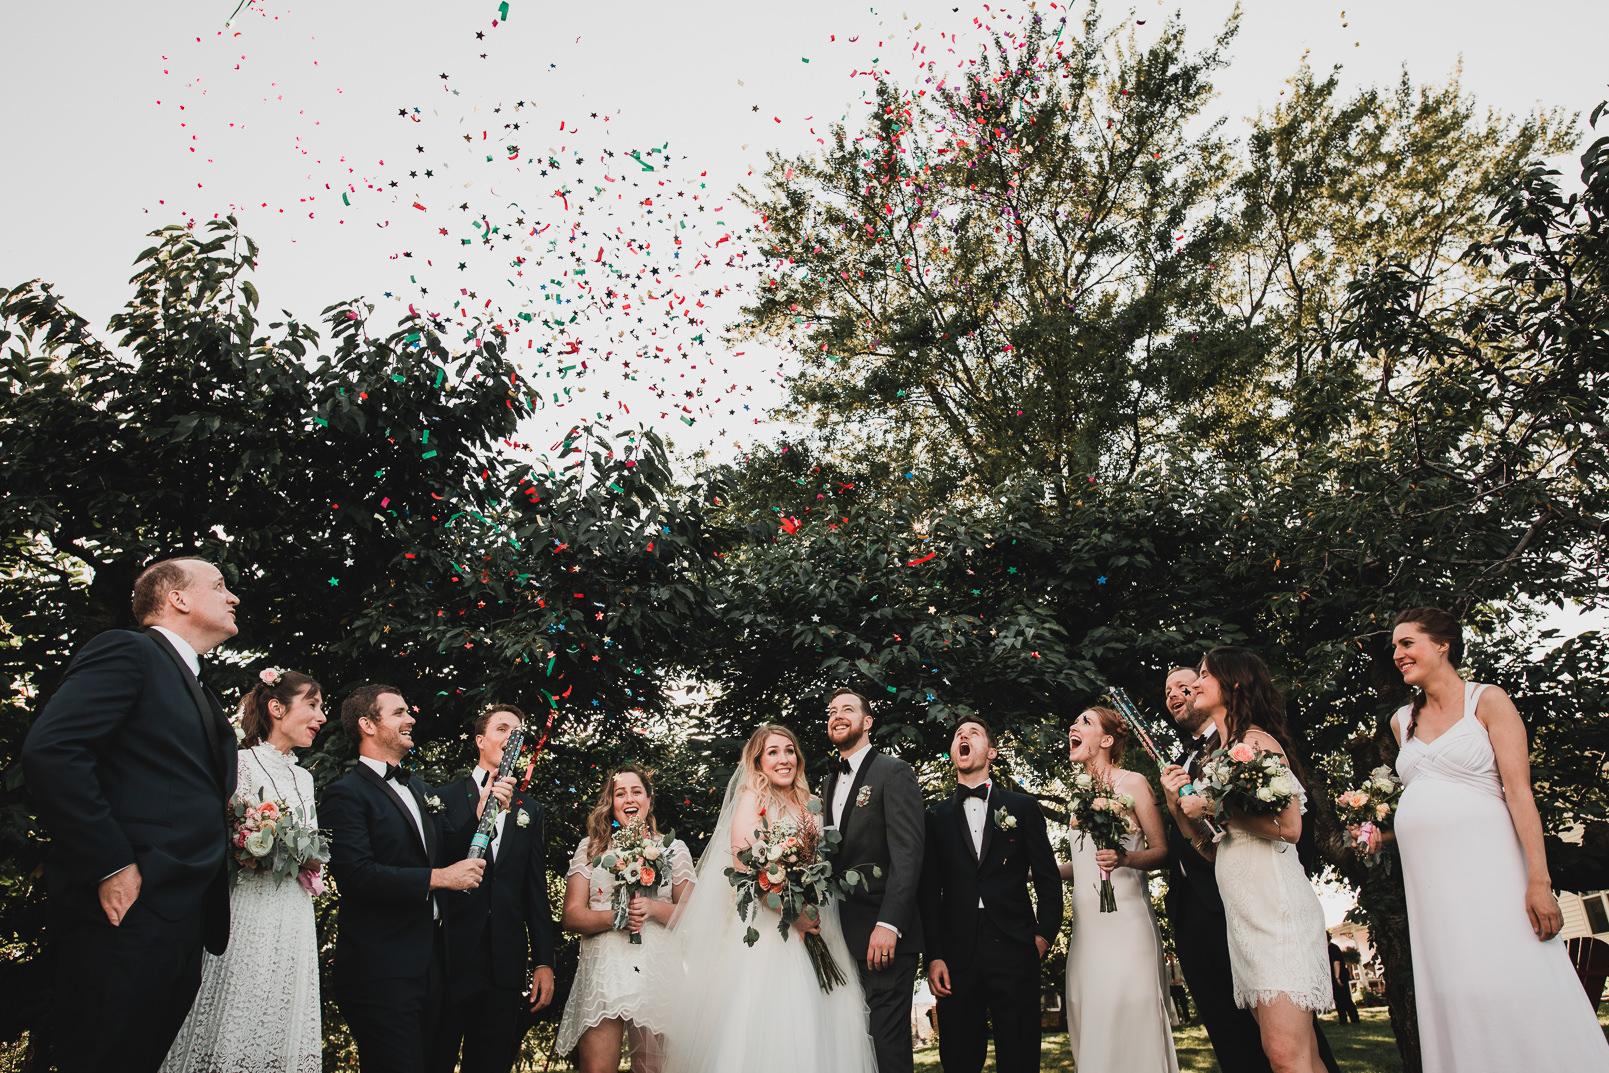 042-Jonathan-Kuhn-Photography-Wedding-_mini.jpg